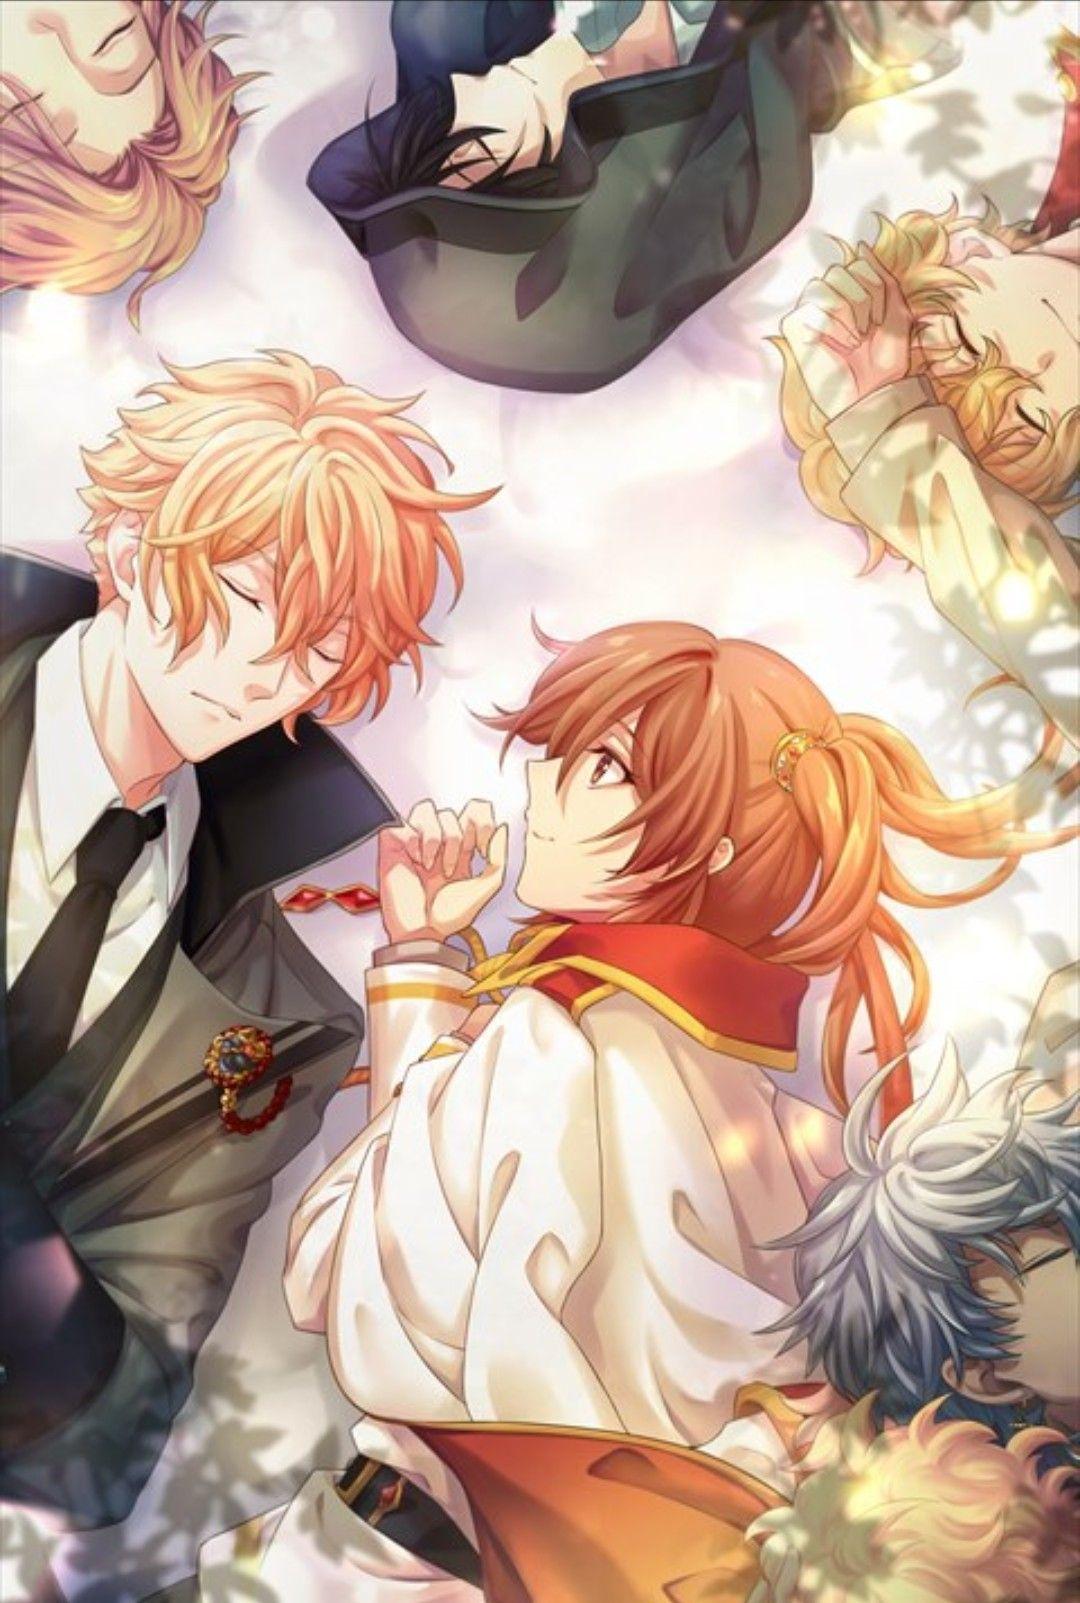 Klaus goldstein anime love story anime harem games